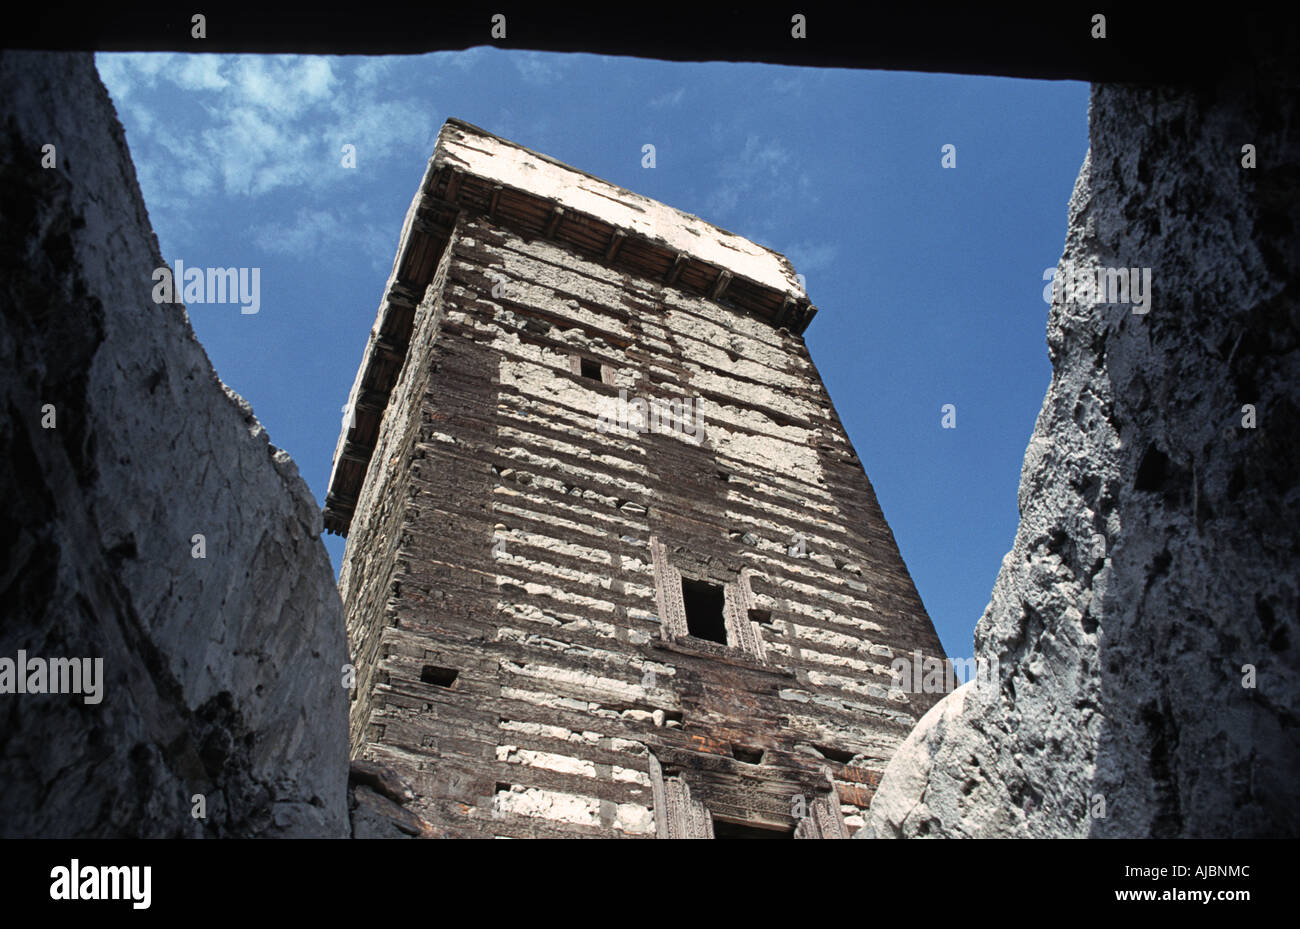 PAKISTAN Altit Fort Karimabad Hunza Valley Karakoram Highway en route to China - Stock Image